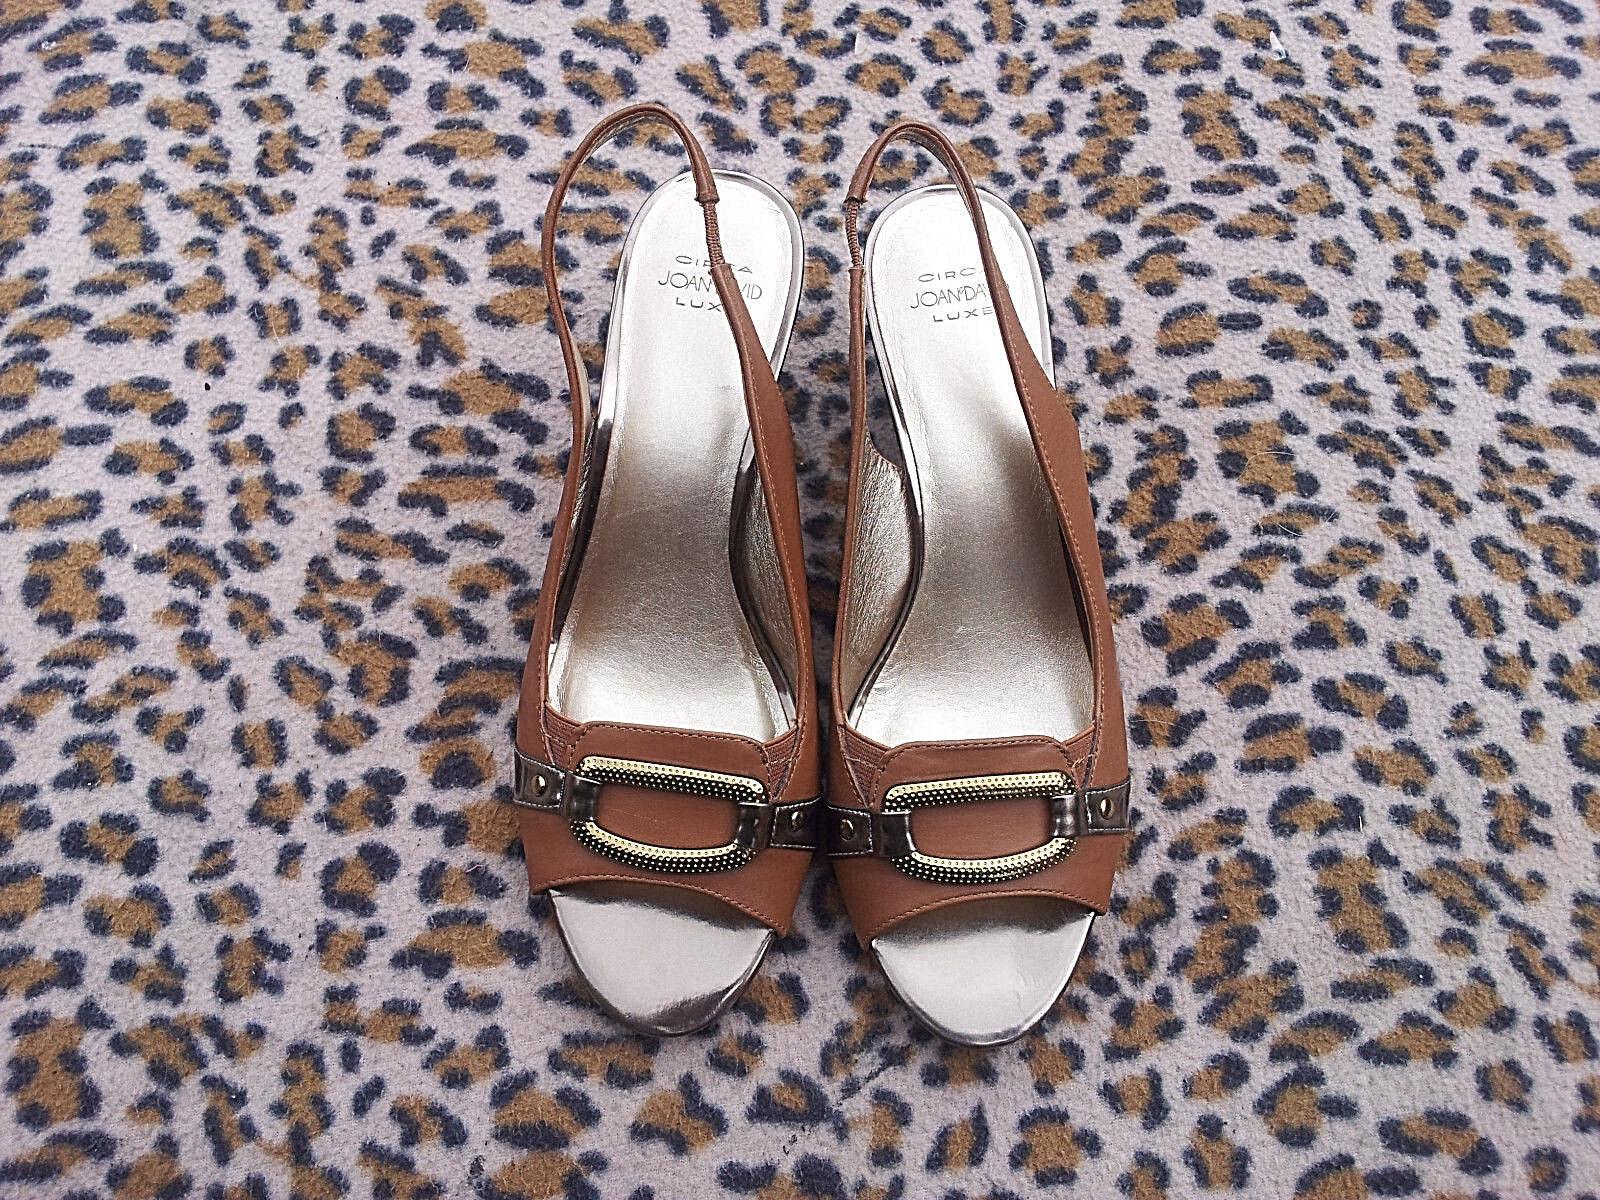 Joan and David braun leather wedge heeled schuhe schuhe schuhe UK Größe 6 EU 39 51d770